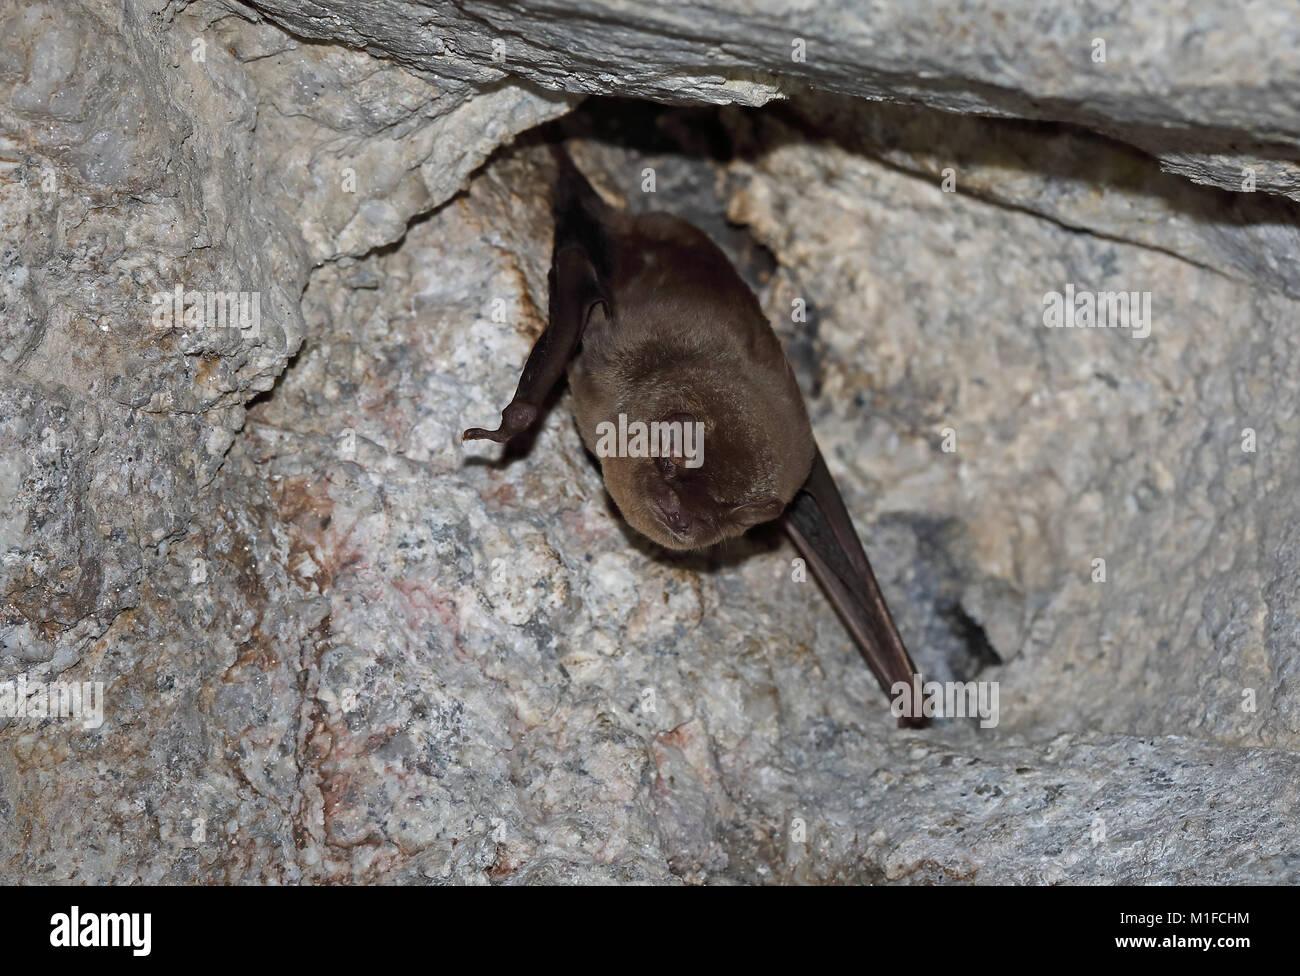 Common Bent-winged Bat (Miniopterus schreibersii) adult hibernating on tunnel roof  Parque Natural Sierra de Andujar, - Stock Image